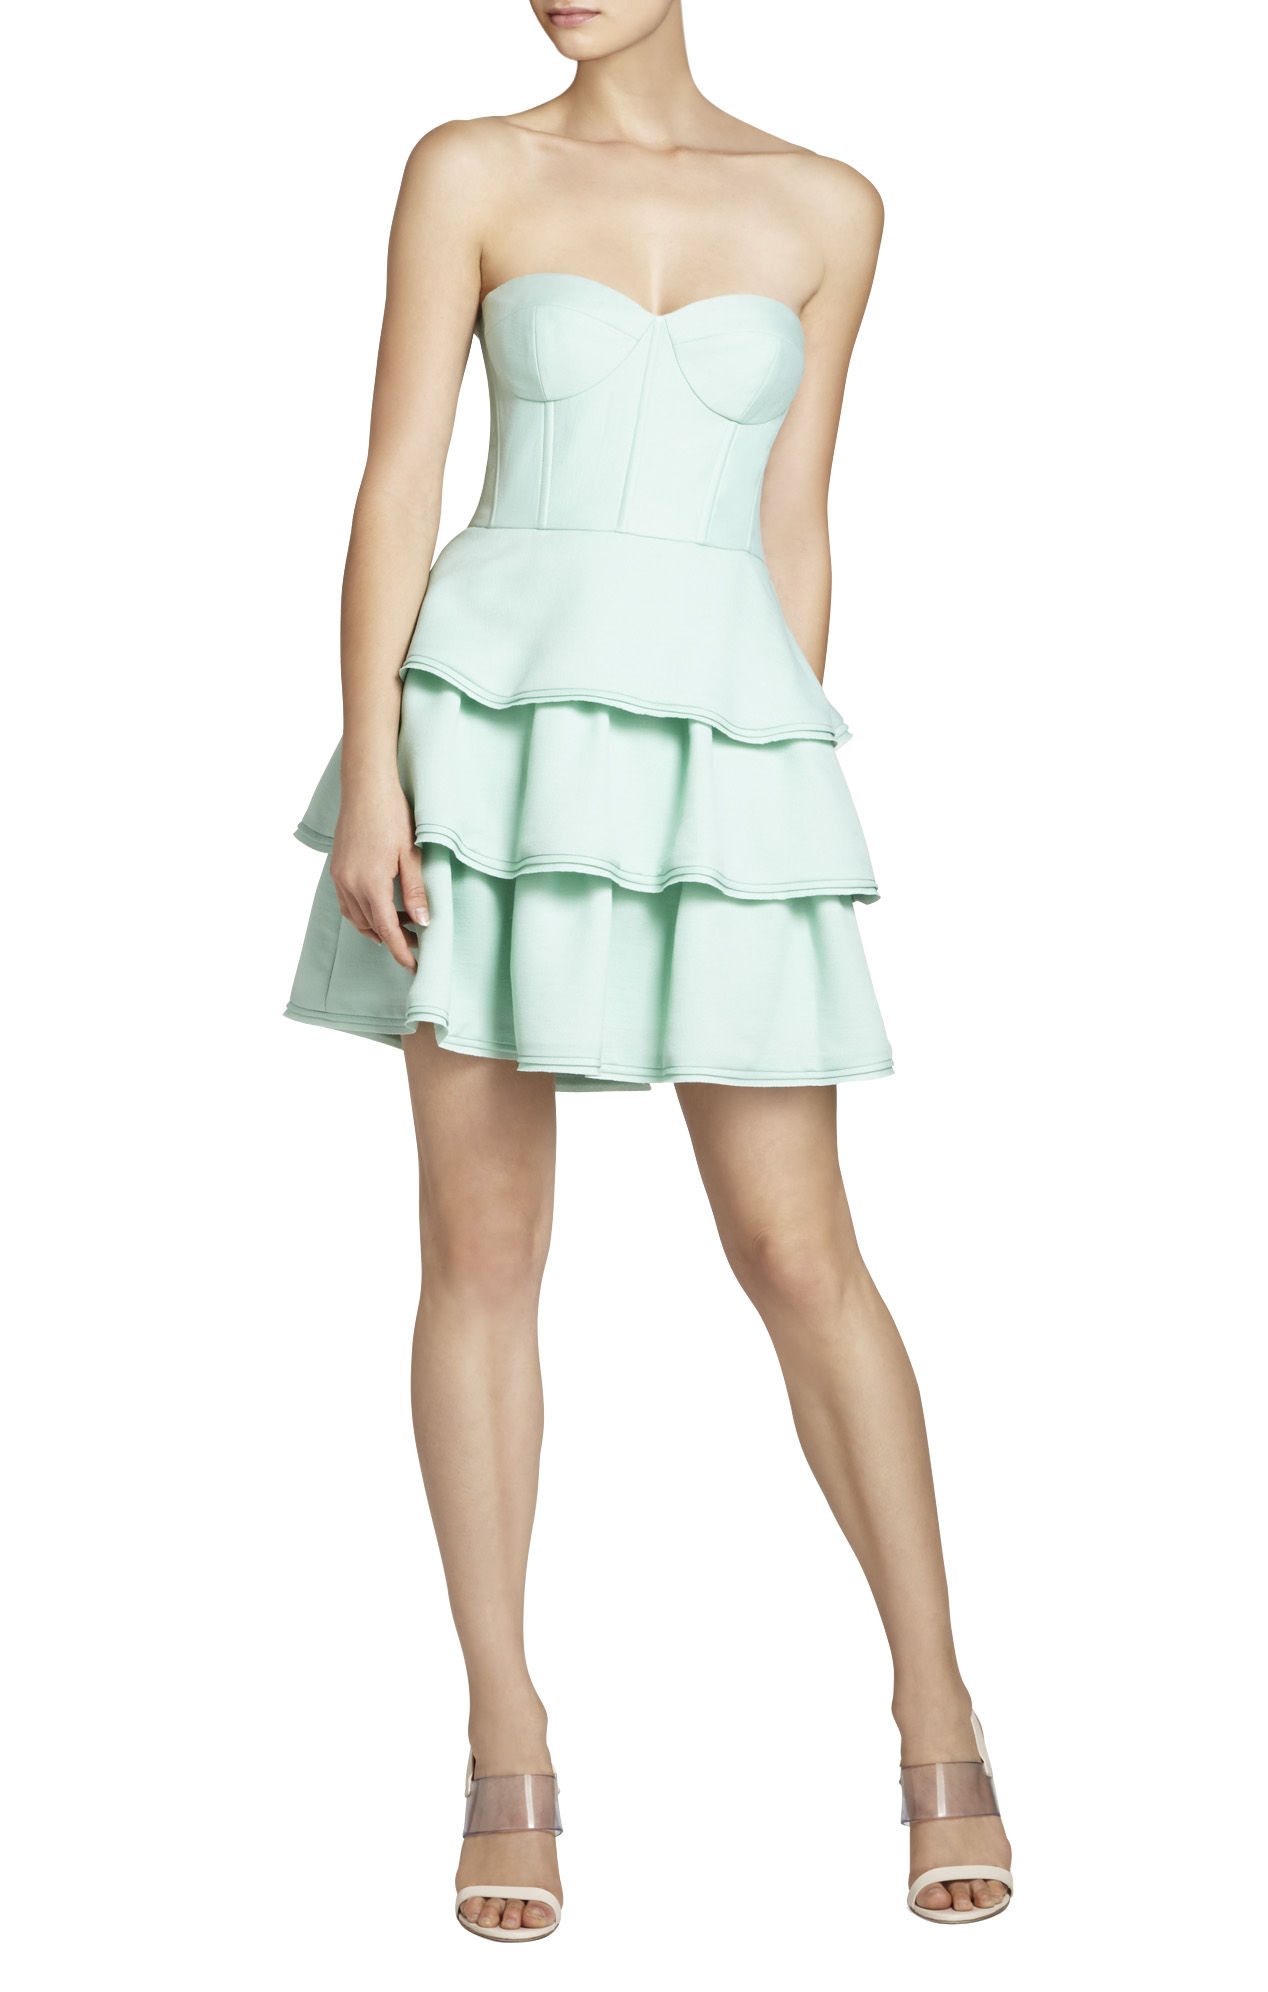 Bcbgmaxazria Jacklyn Sleeveless Tiered Ruffle-skirt Dress in Green (OPALINE GREEN) - Save 50% | Lyst